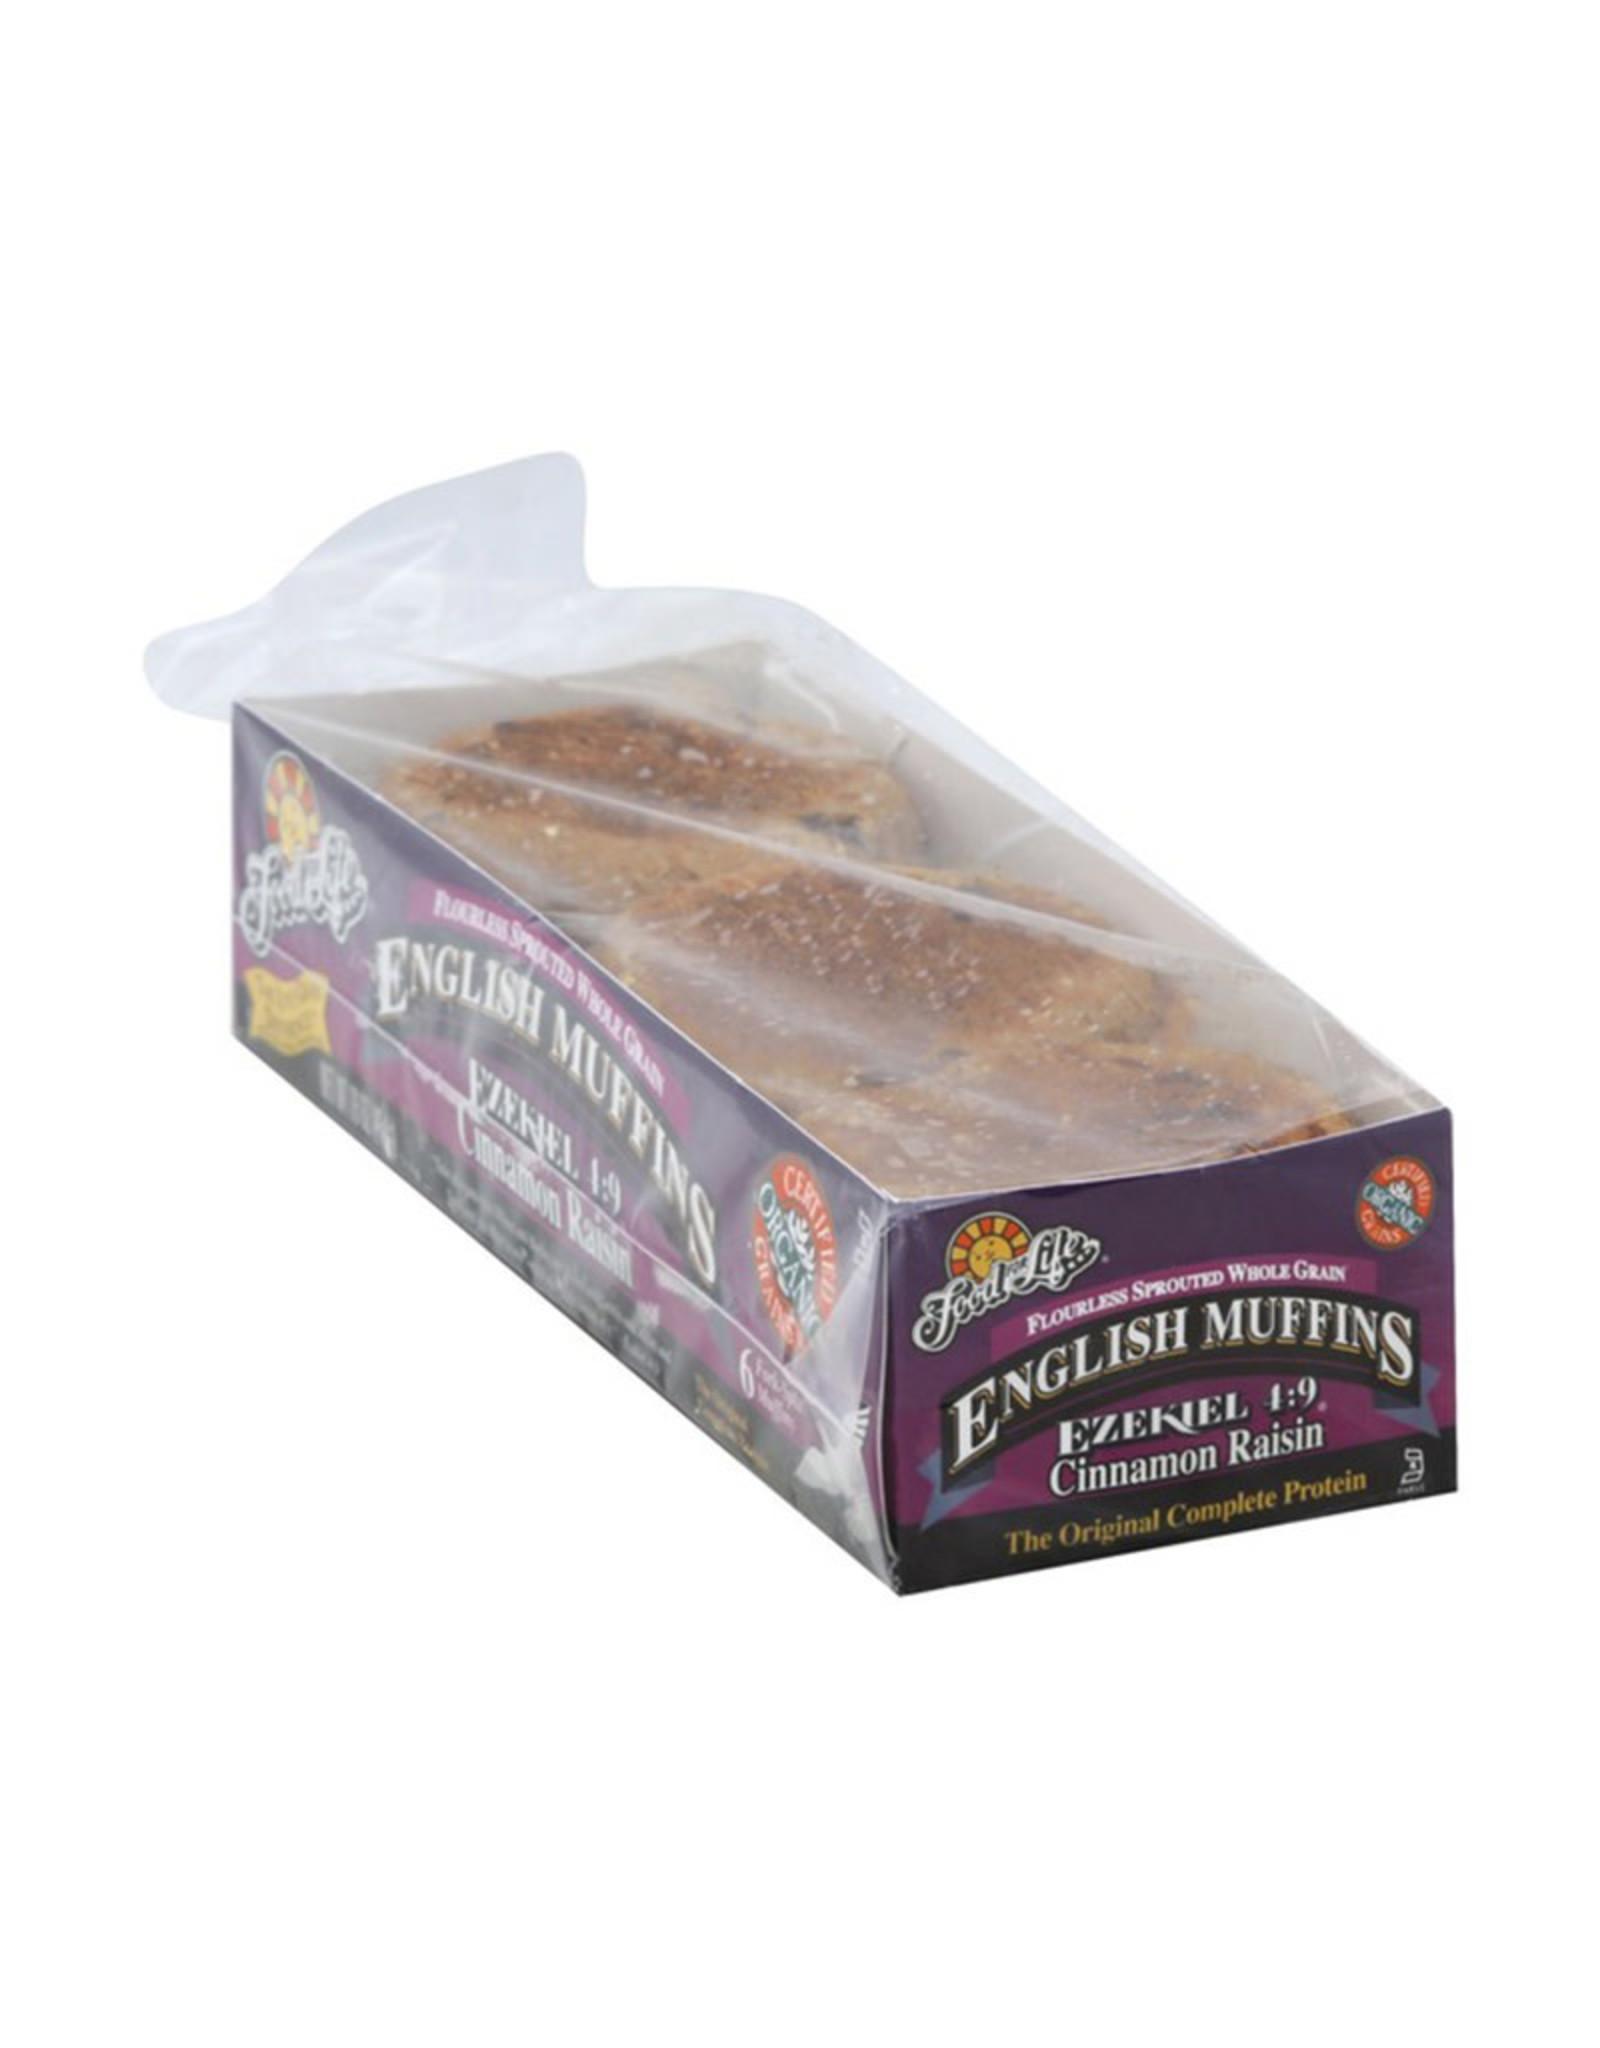 Food For Life FFL - English Muffin, Ezekiel Cinnamon Raisin